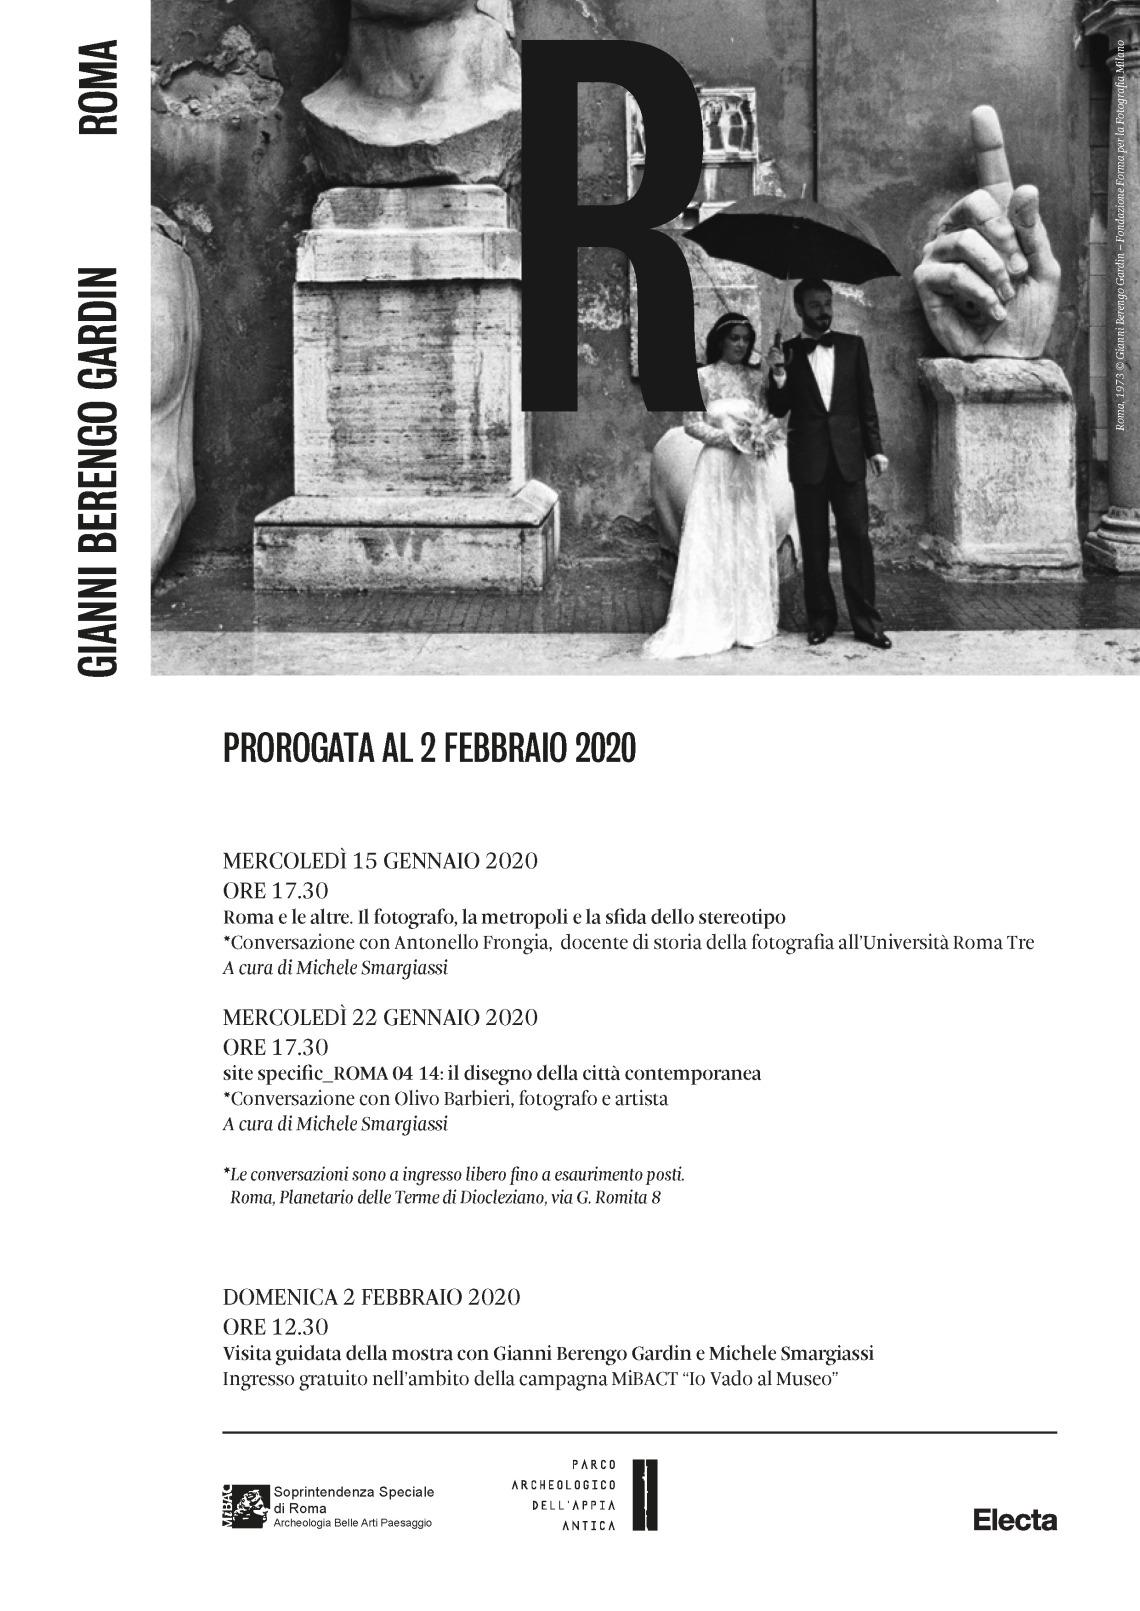 ciclo conferenze_ROMA_Berengo